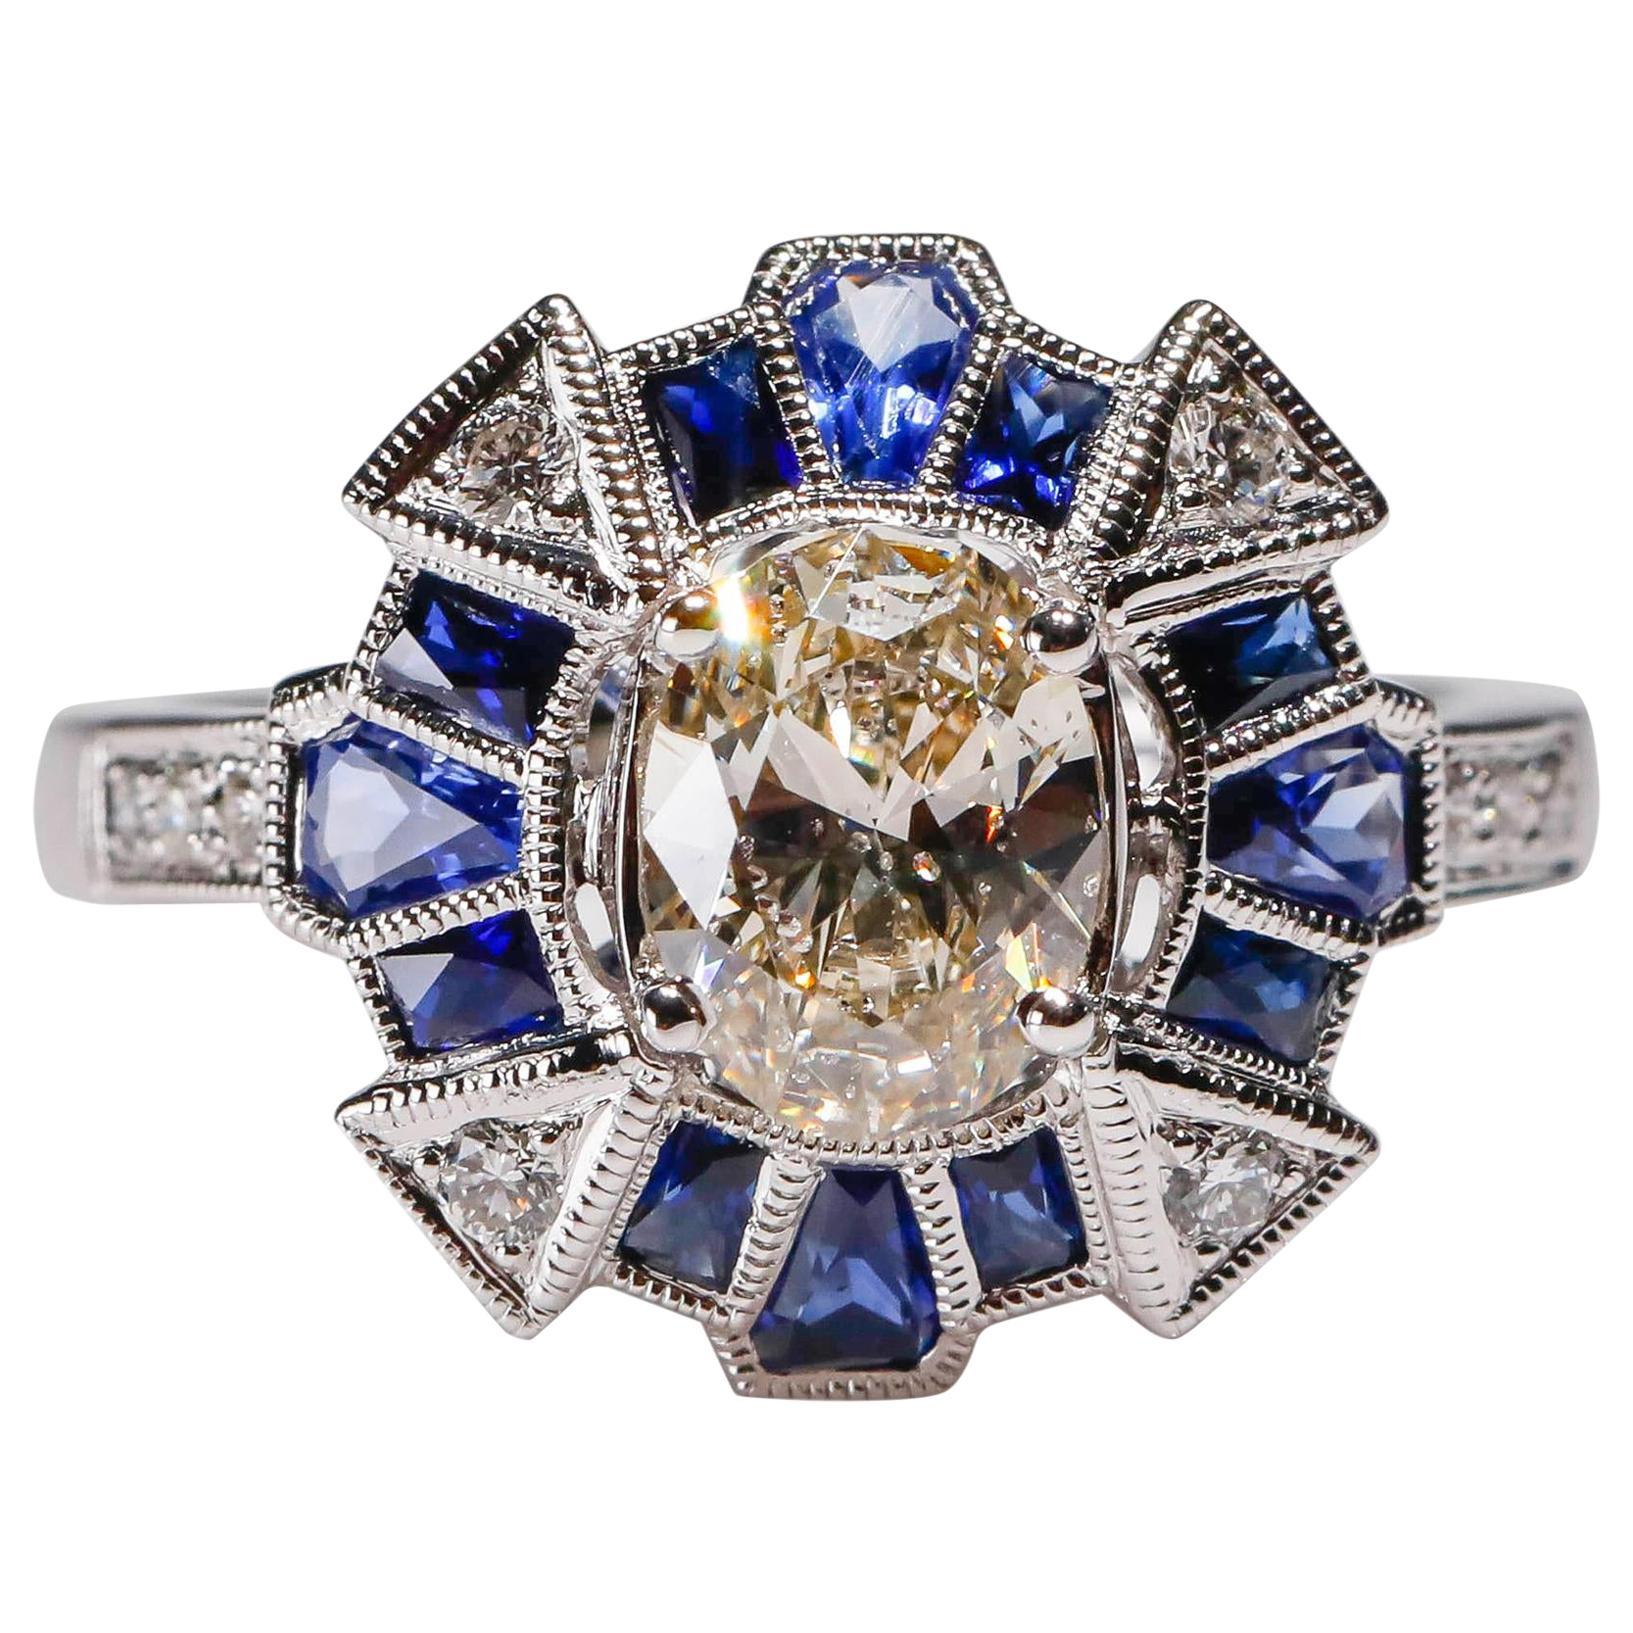 18 Kt Gold 1.17 Carat Diamond 1 Carat Blue Sapphire Round Cocktail Dome Ring